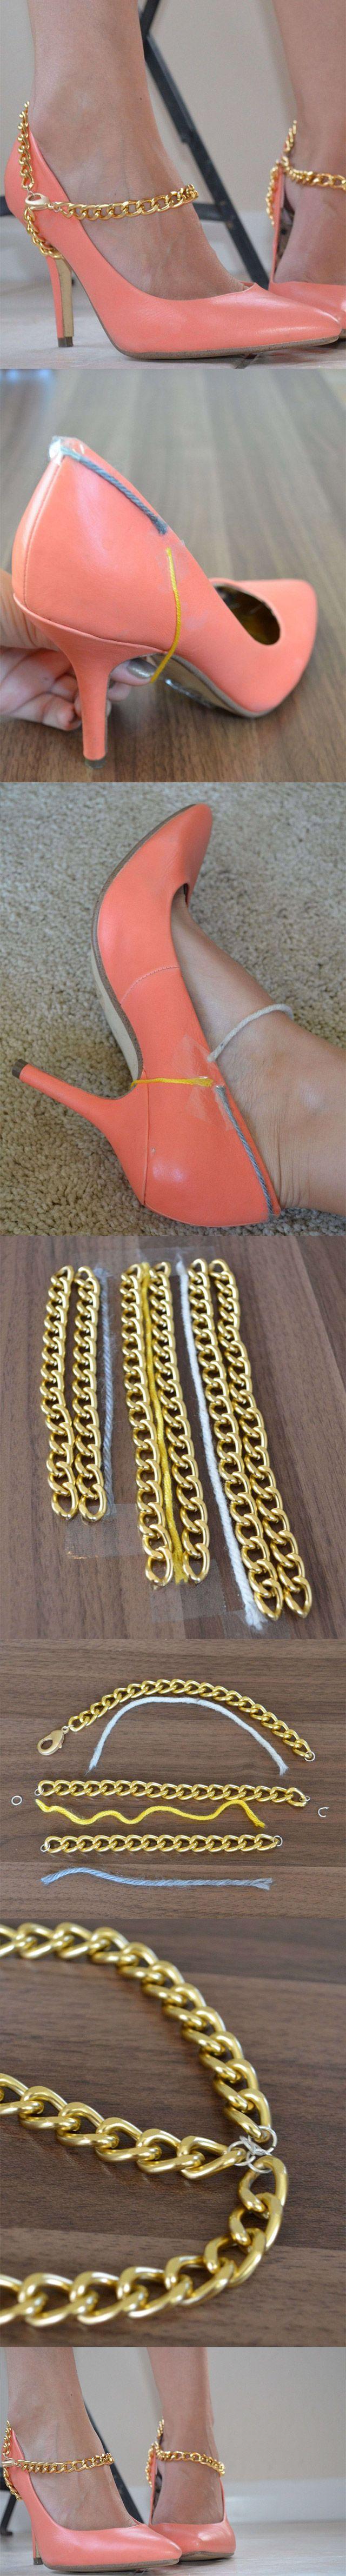 DIY: Heel Chains